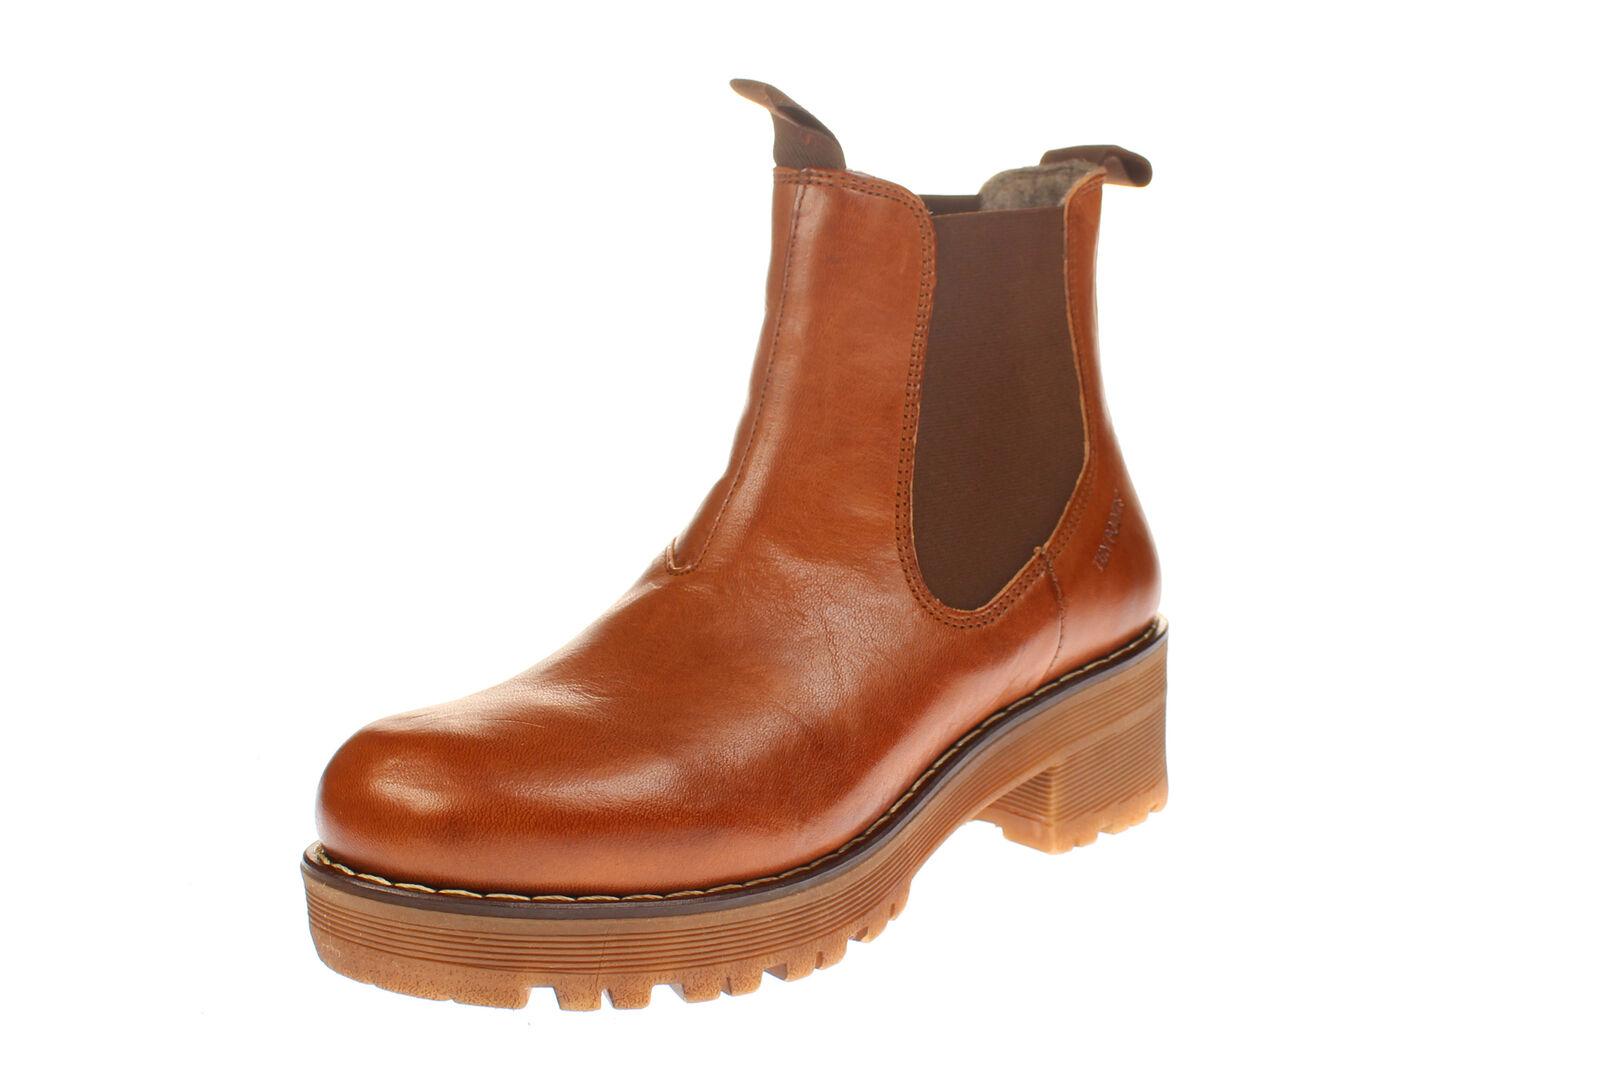 Ten Points 238010 CLARISSE - Damen Schuhe Stiefeletten - 319-cognac